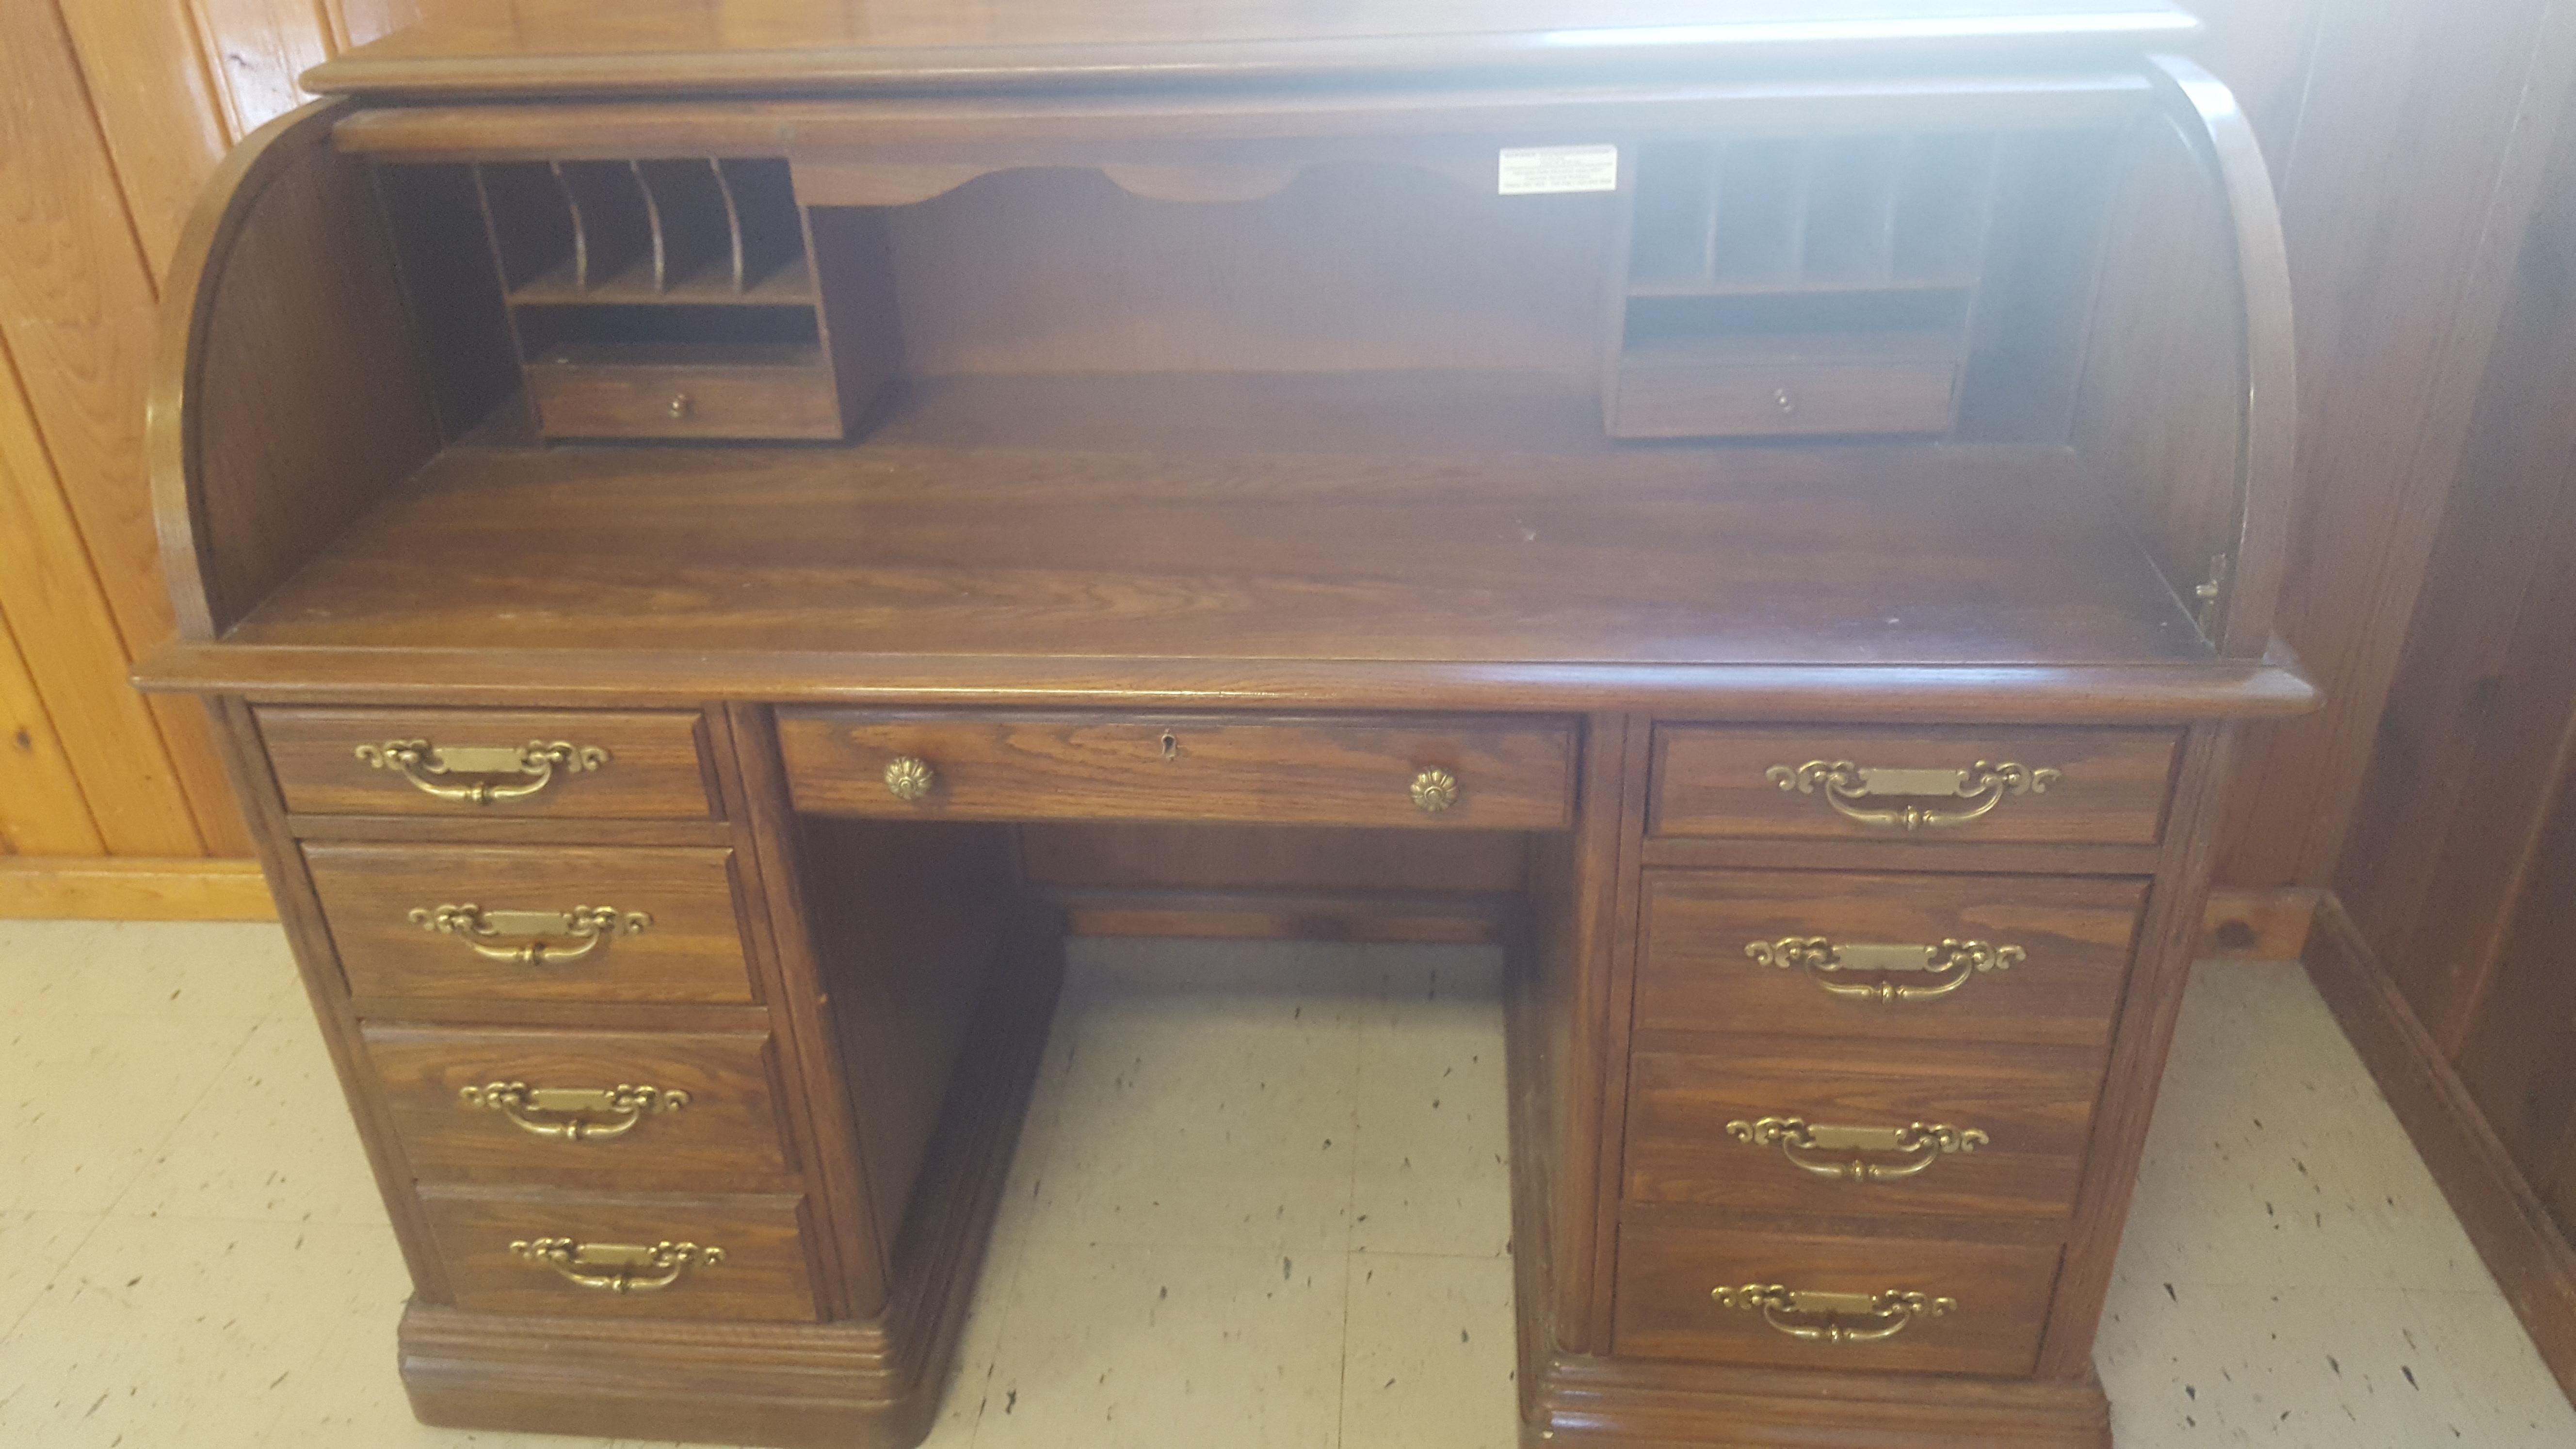 jasper cabinet roll top desk 688 rt antique appraisal instappraisal rh instappraisal com